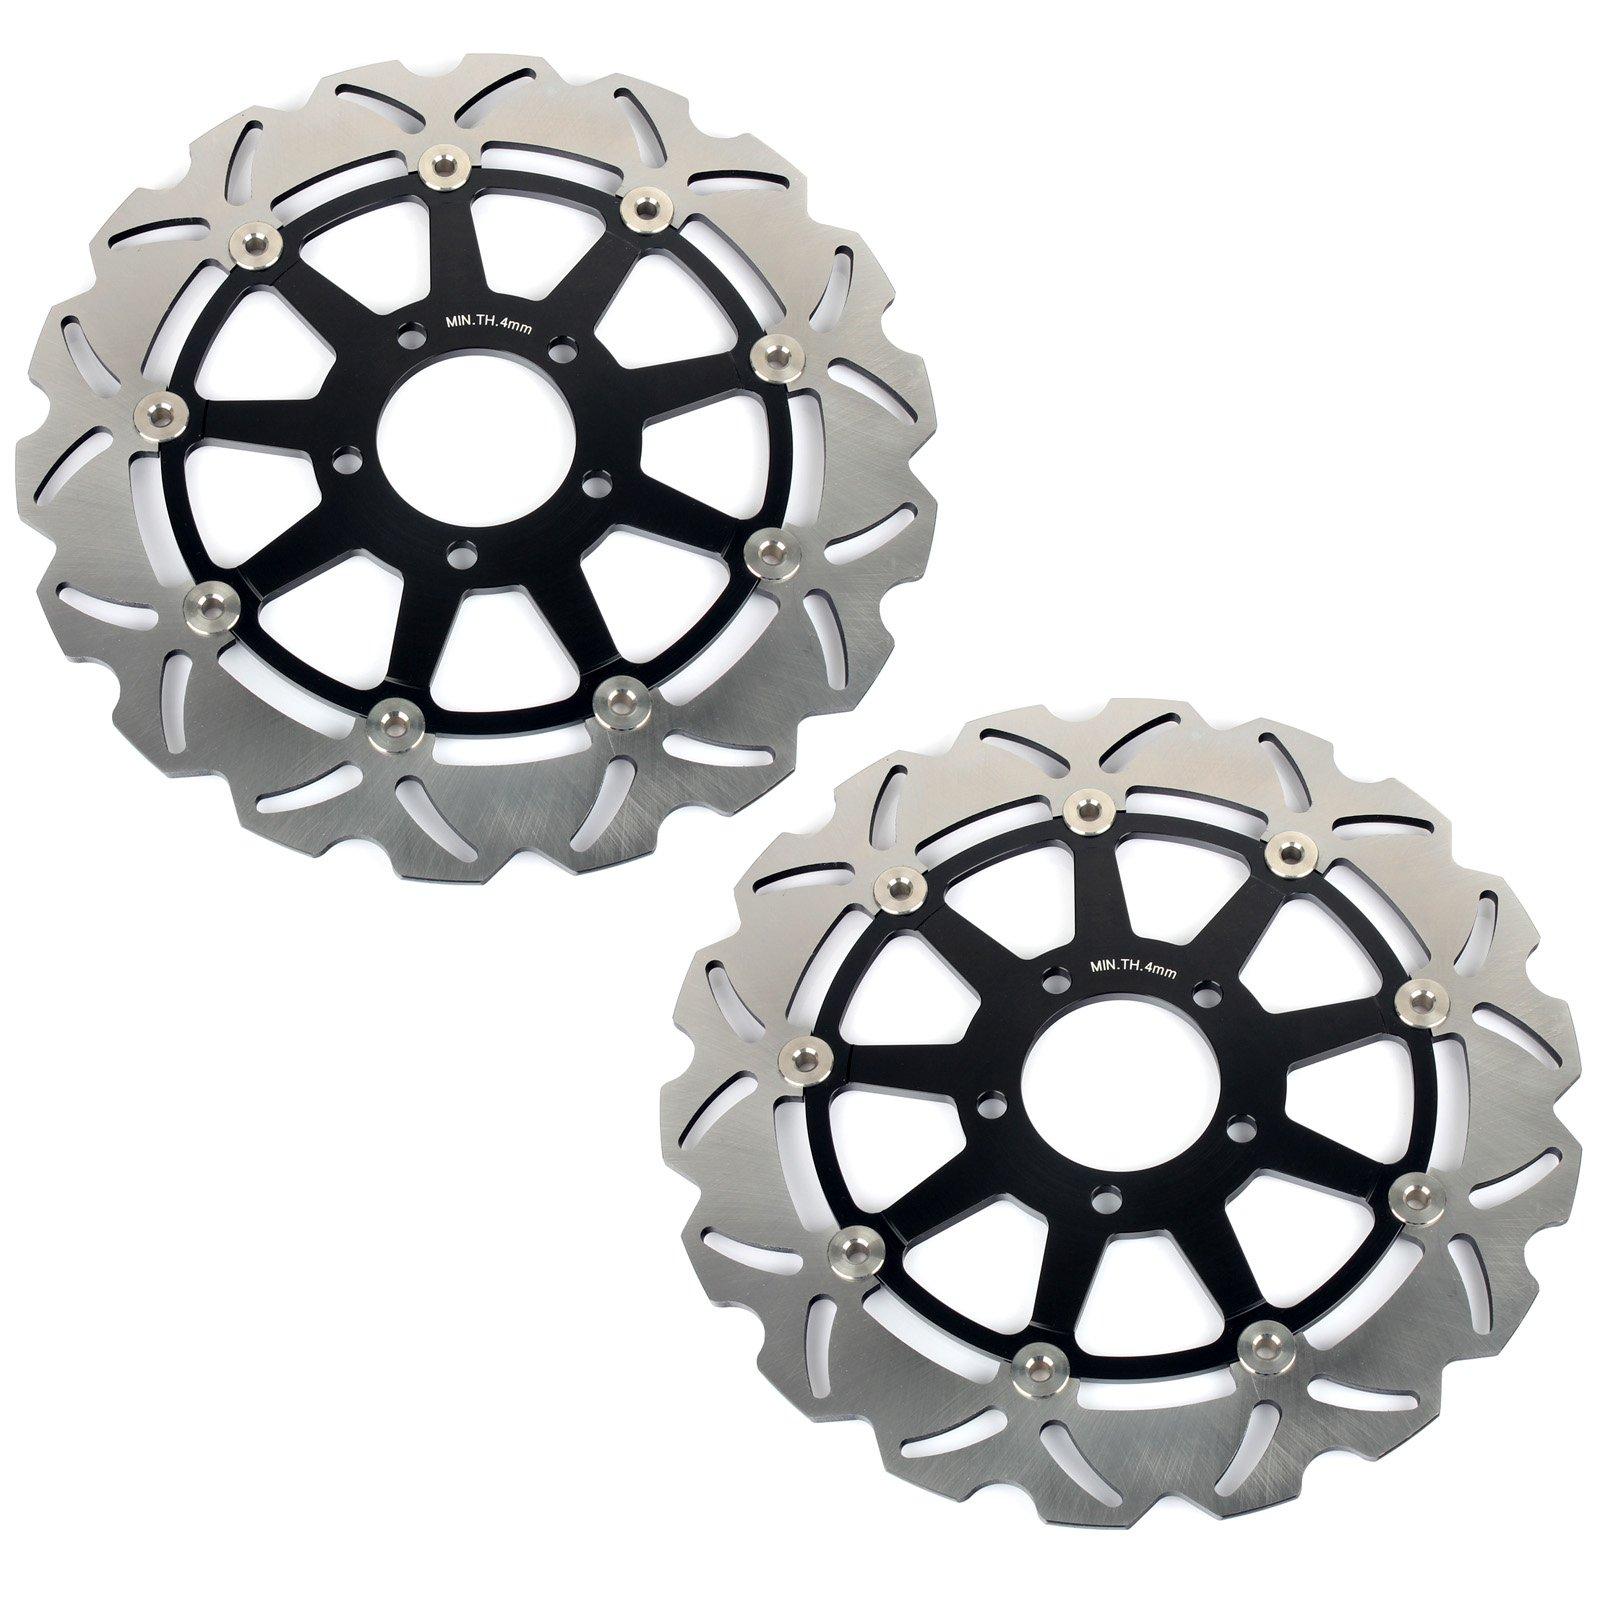 GSXR Front Brake Discs Rotors for Suzuki GSXR600 GSXR750 1997-2003 GSXR1000 2001 2002 Hayabusa GSX1300R 1999-2007 TL1000R TL1000S 98-01 by TARAZON (Image #2)